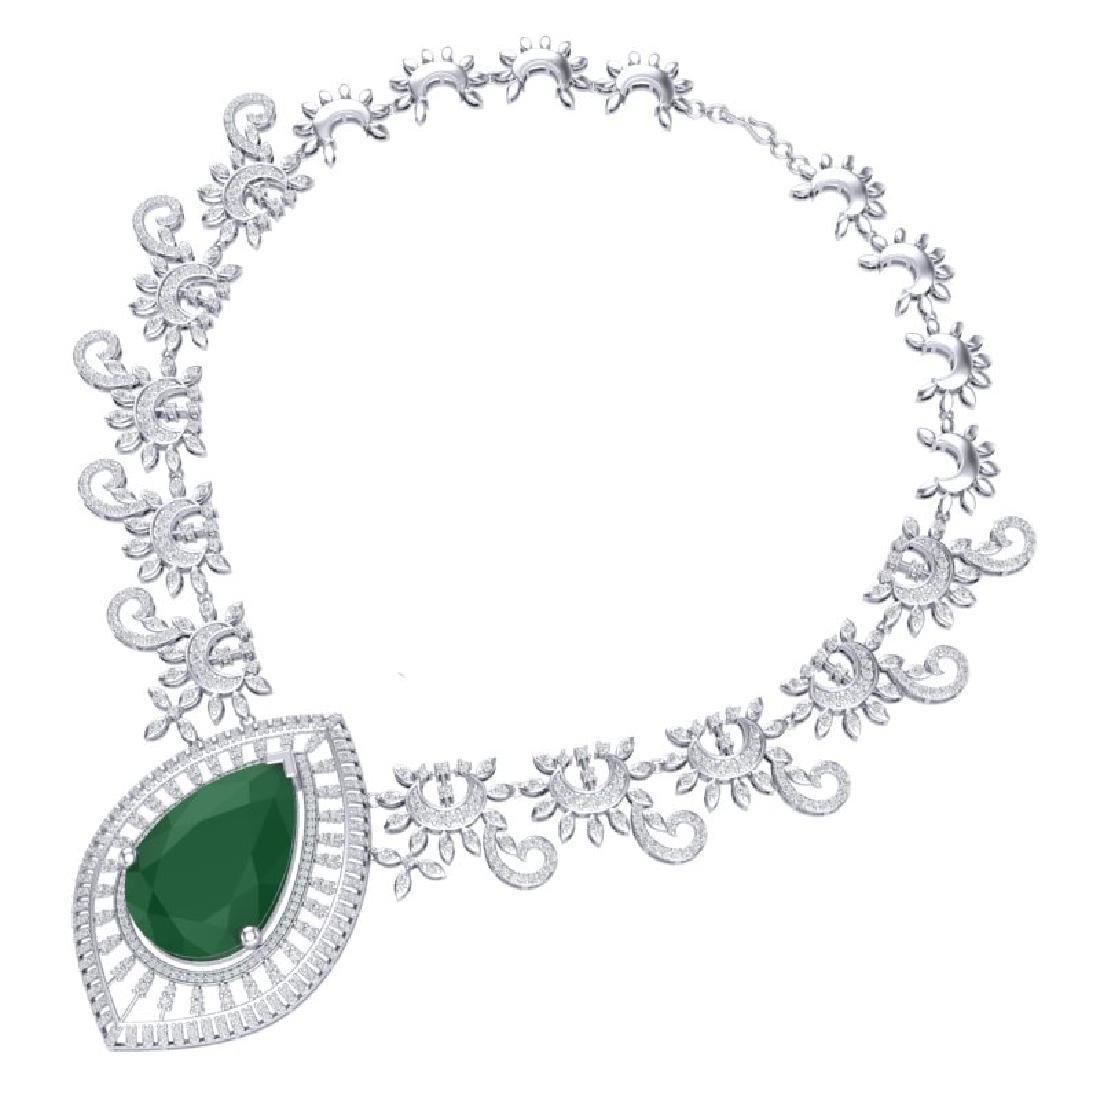 65.75 CTW Royalty Emerald & VS Diamond Necklace 18K - 3